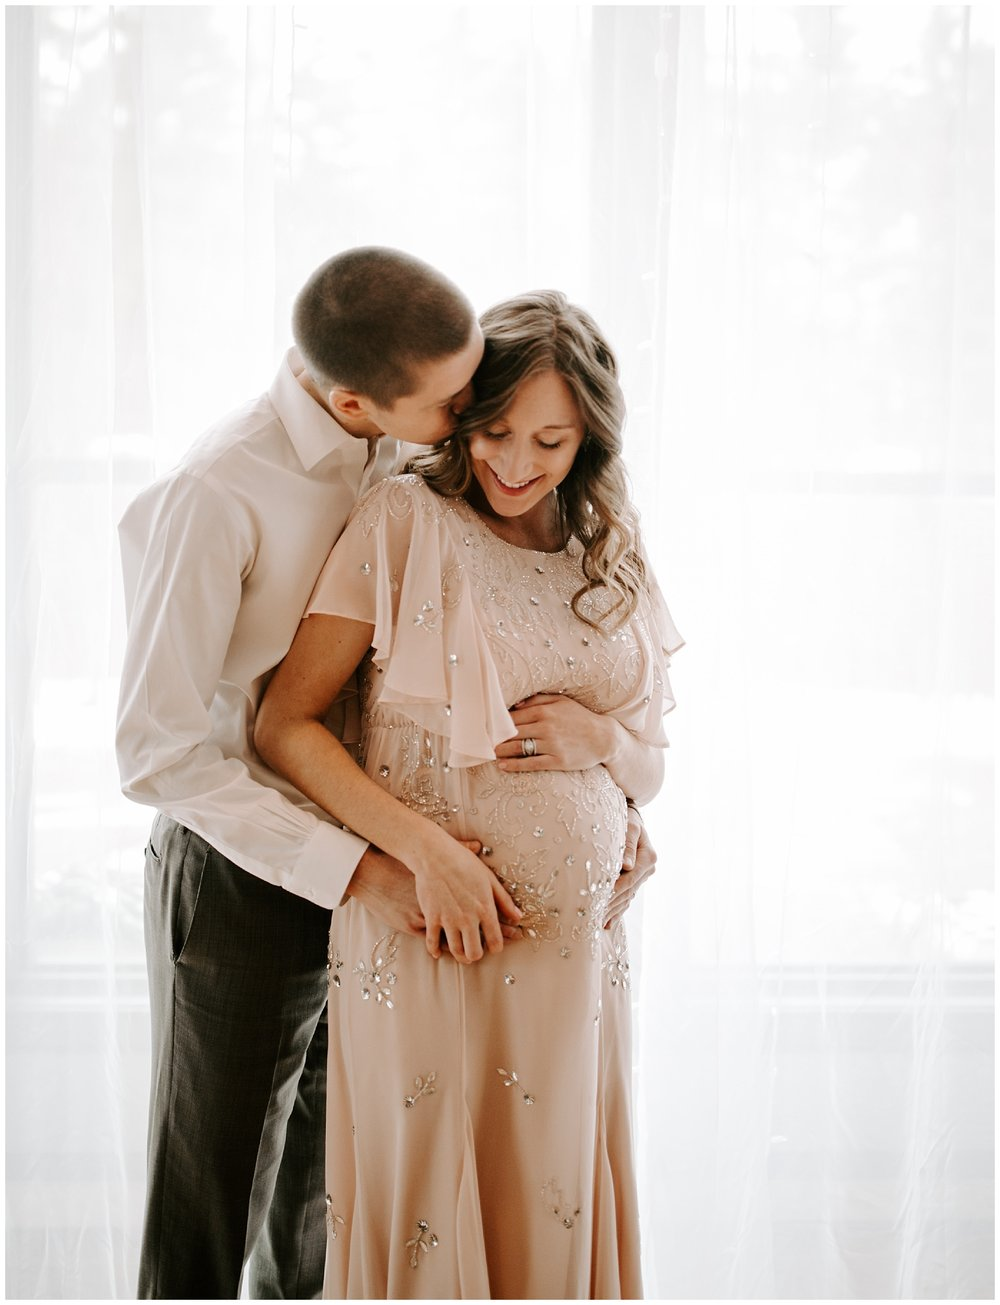 Becca+Grant-Maternity-12_WEB.jpg